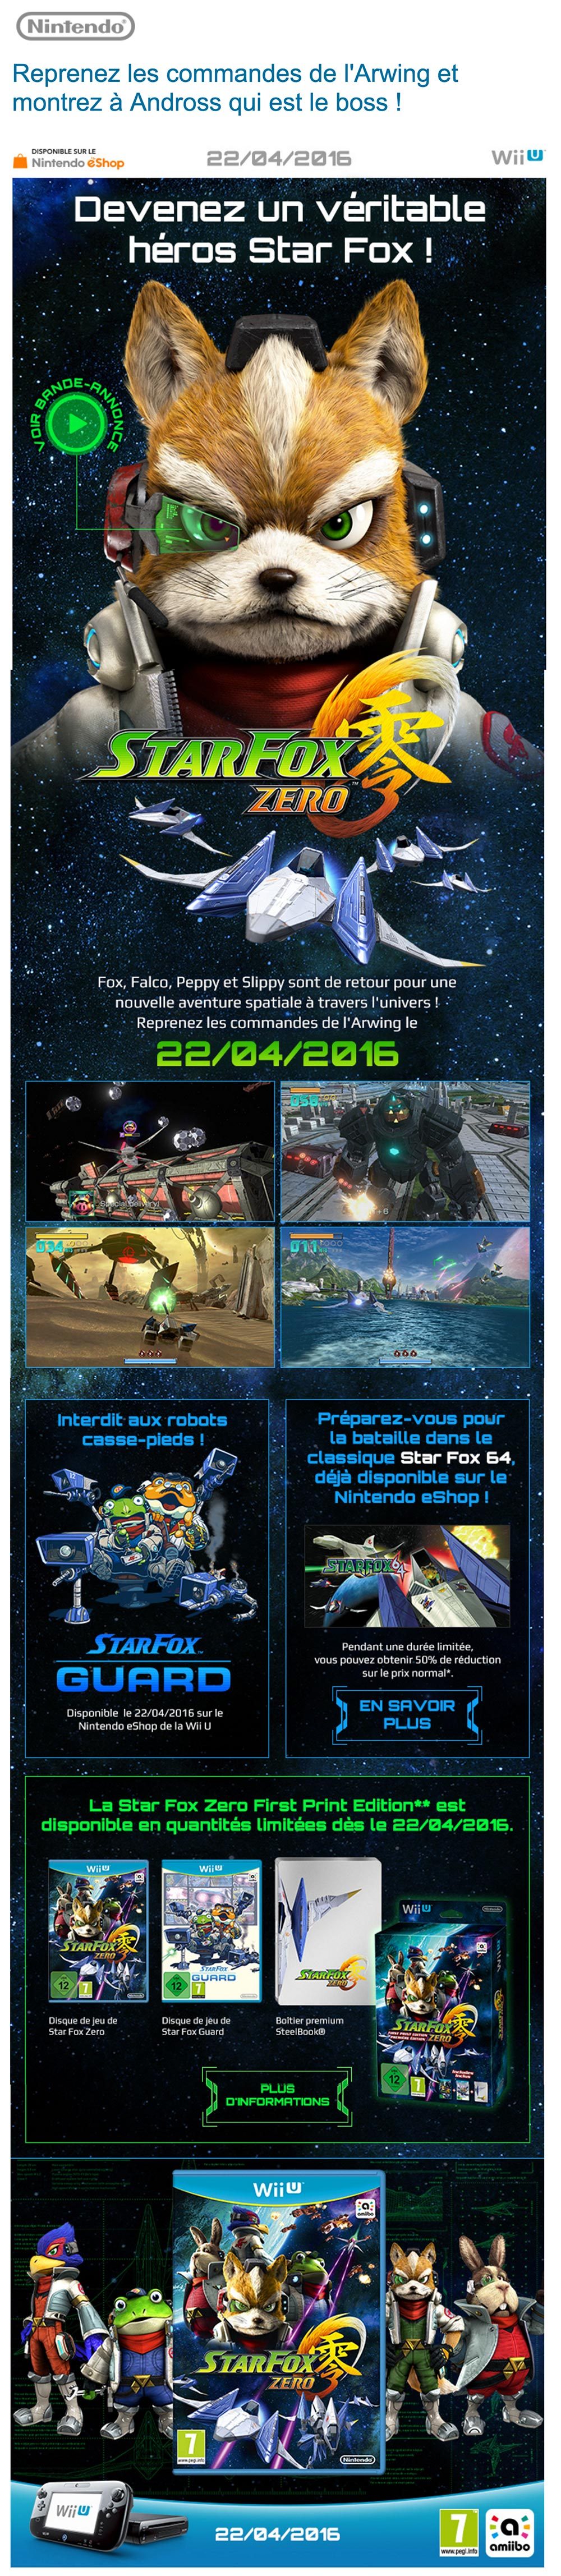 Newsletter Star Fox Zero de Nintendo